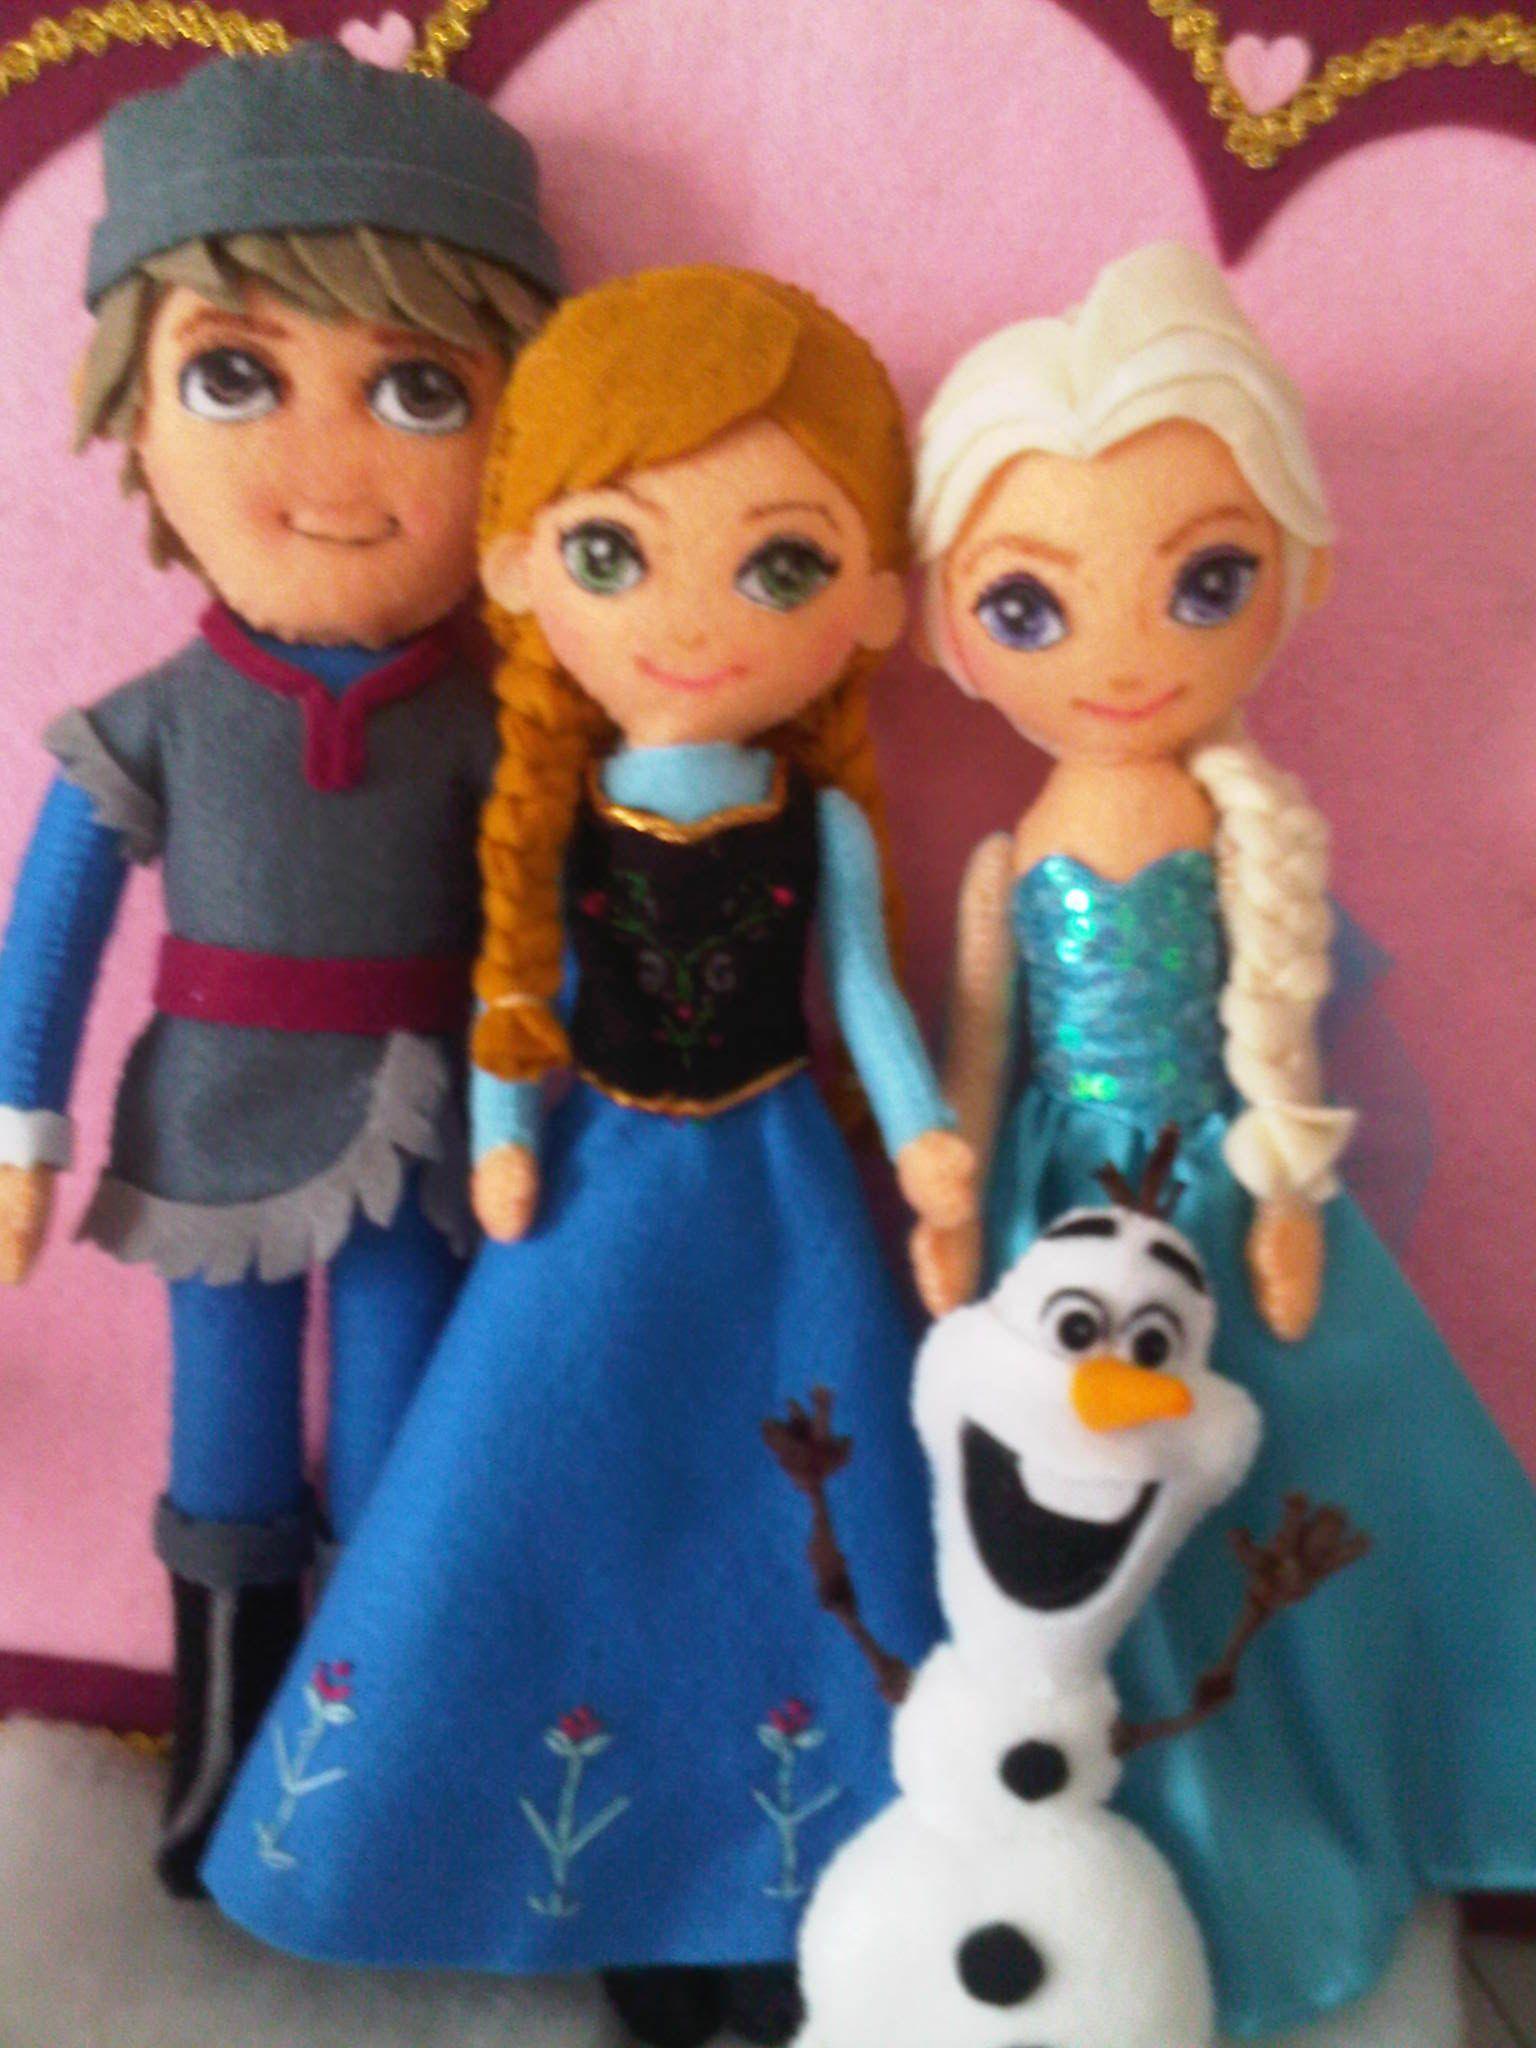 Frozen felt dolls | decoraçao frozer | Pinterest | Puppen, Filz und ...